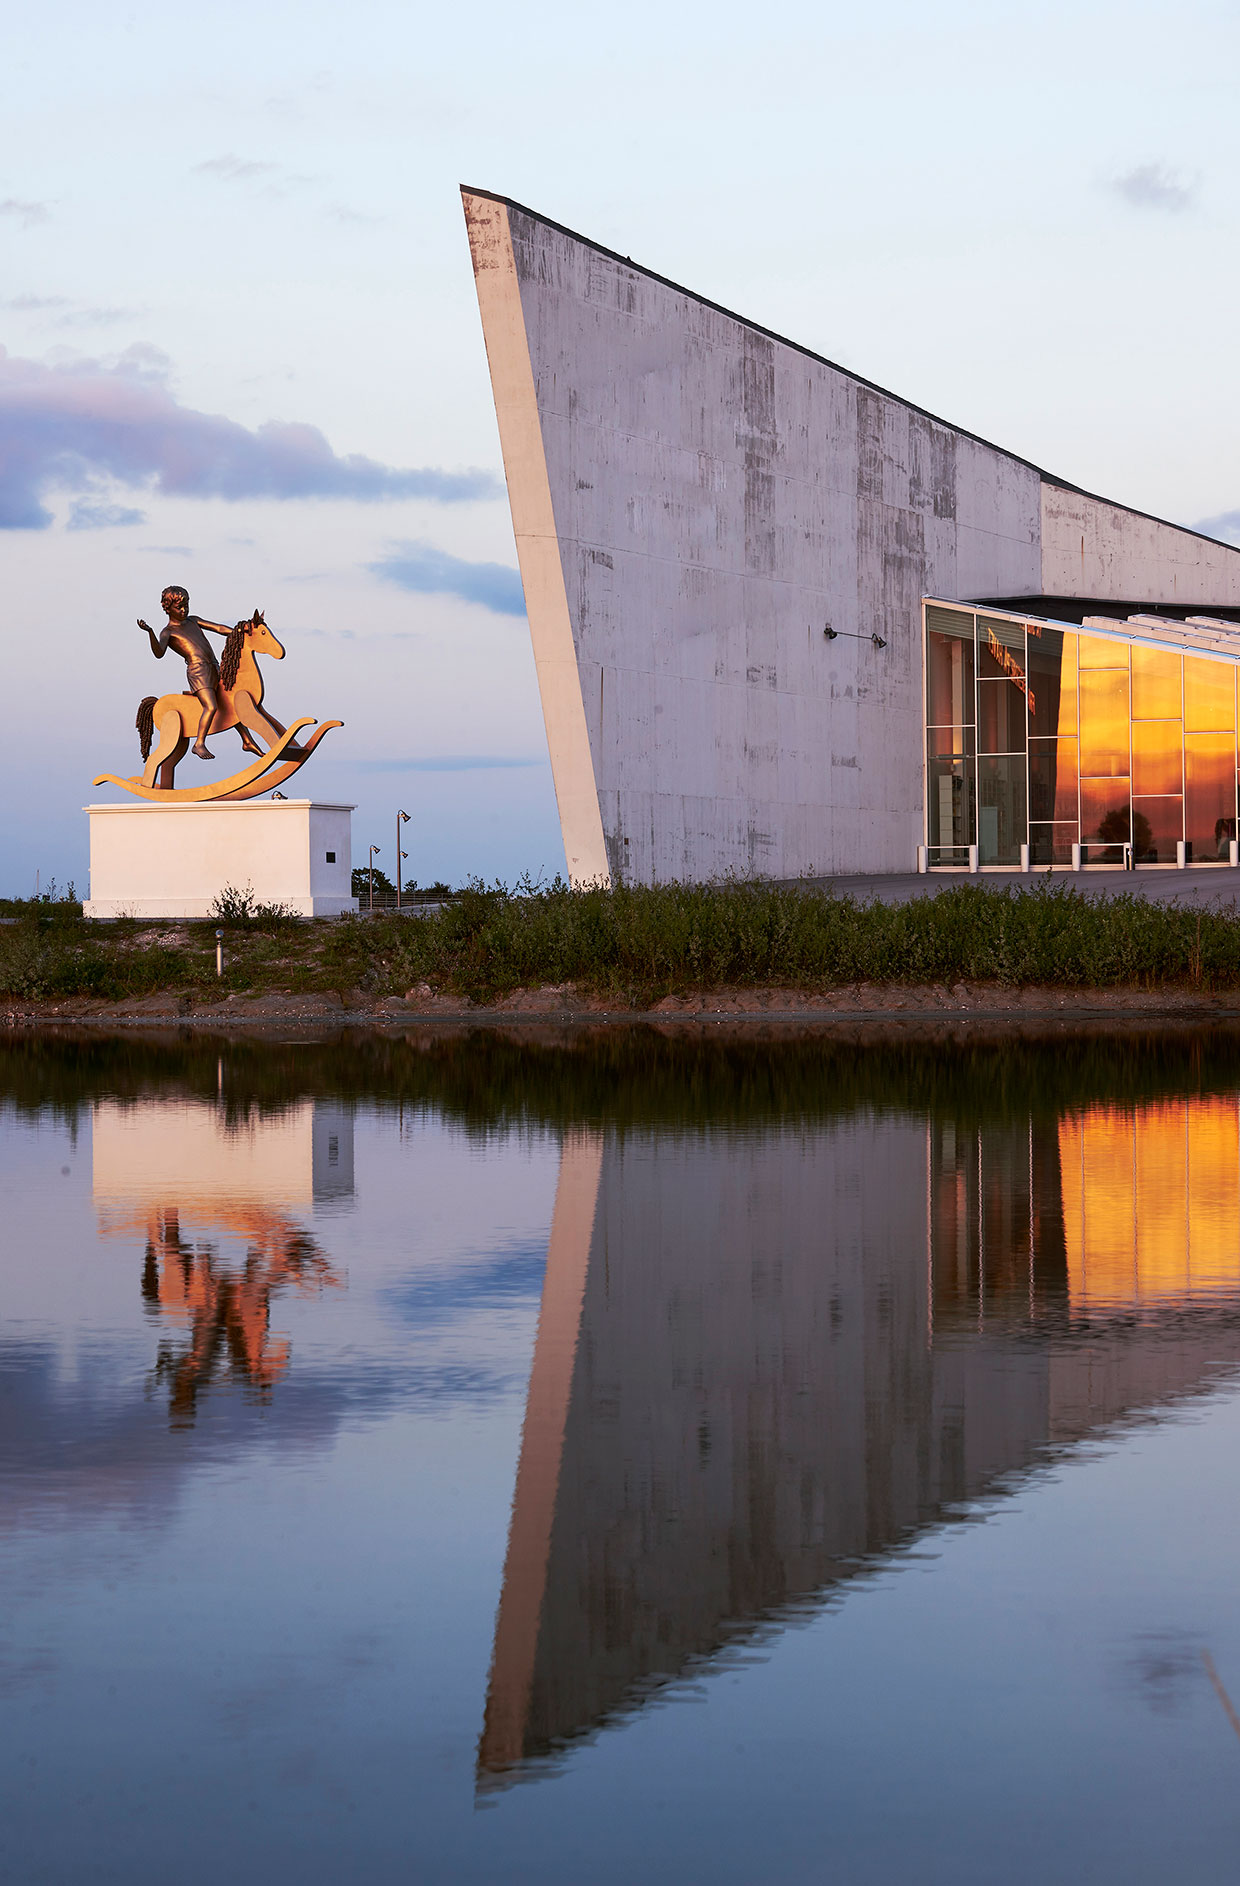 ARKEN Museum of Modern Art. Photo: Torben Petersen